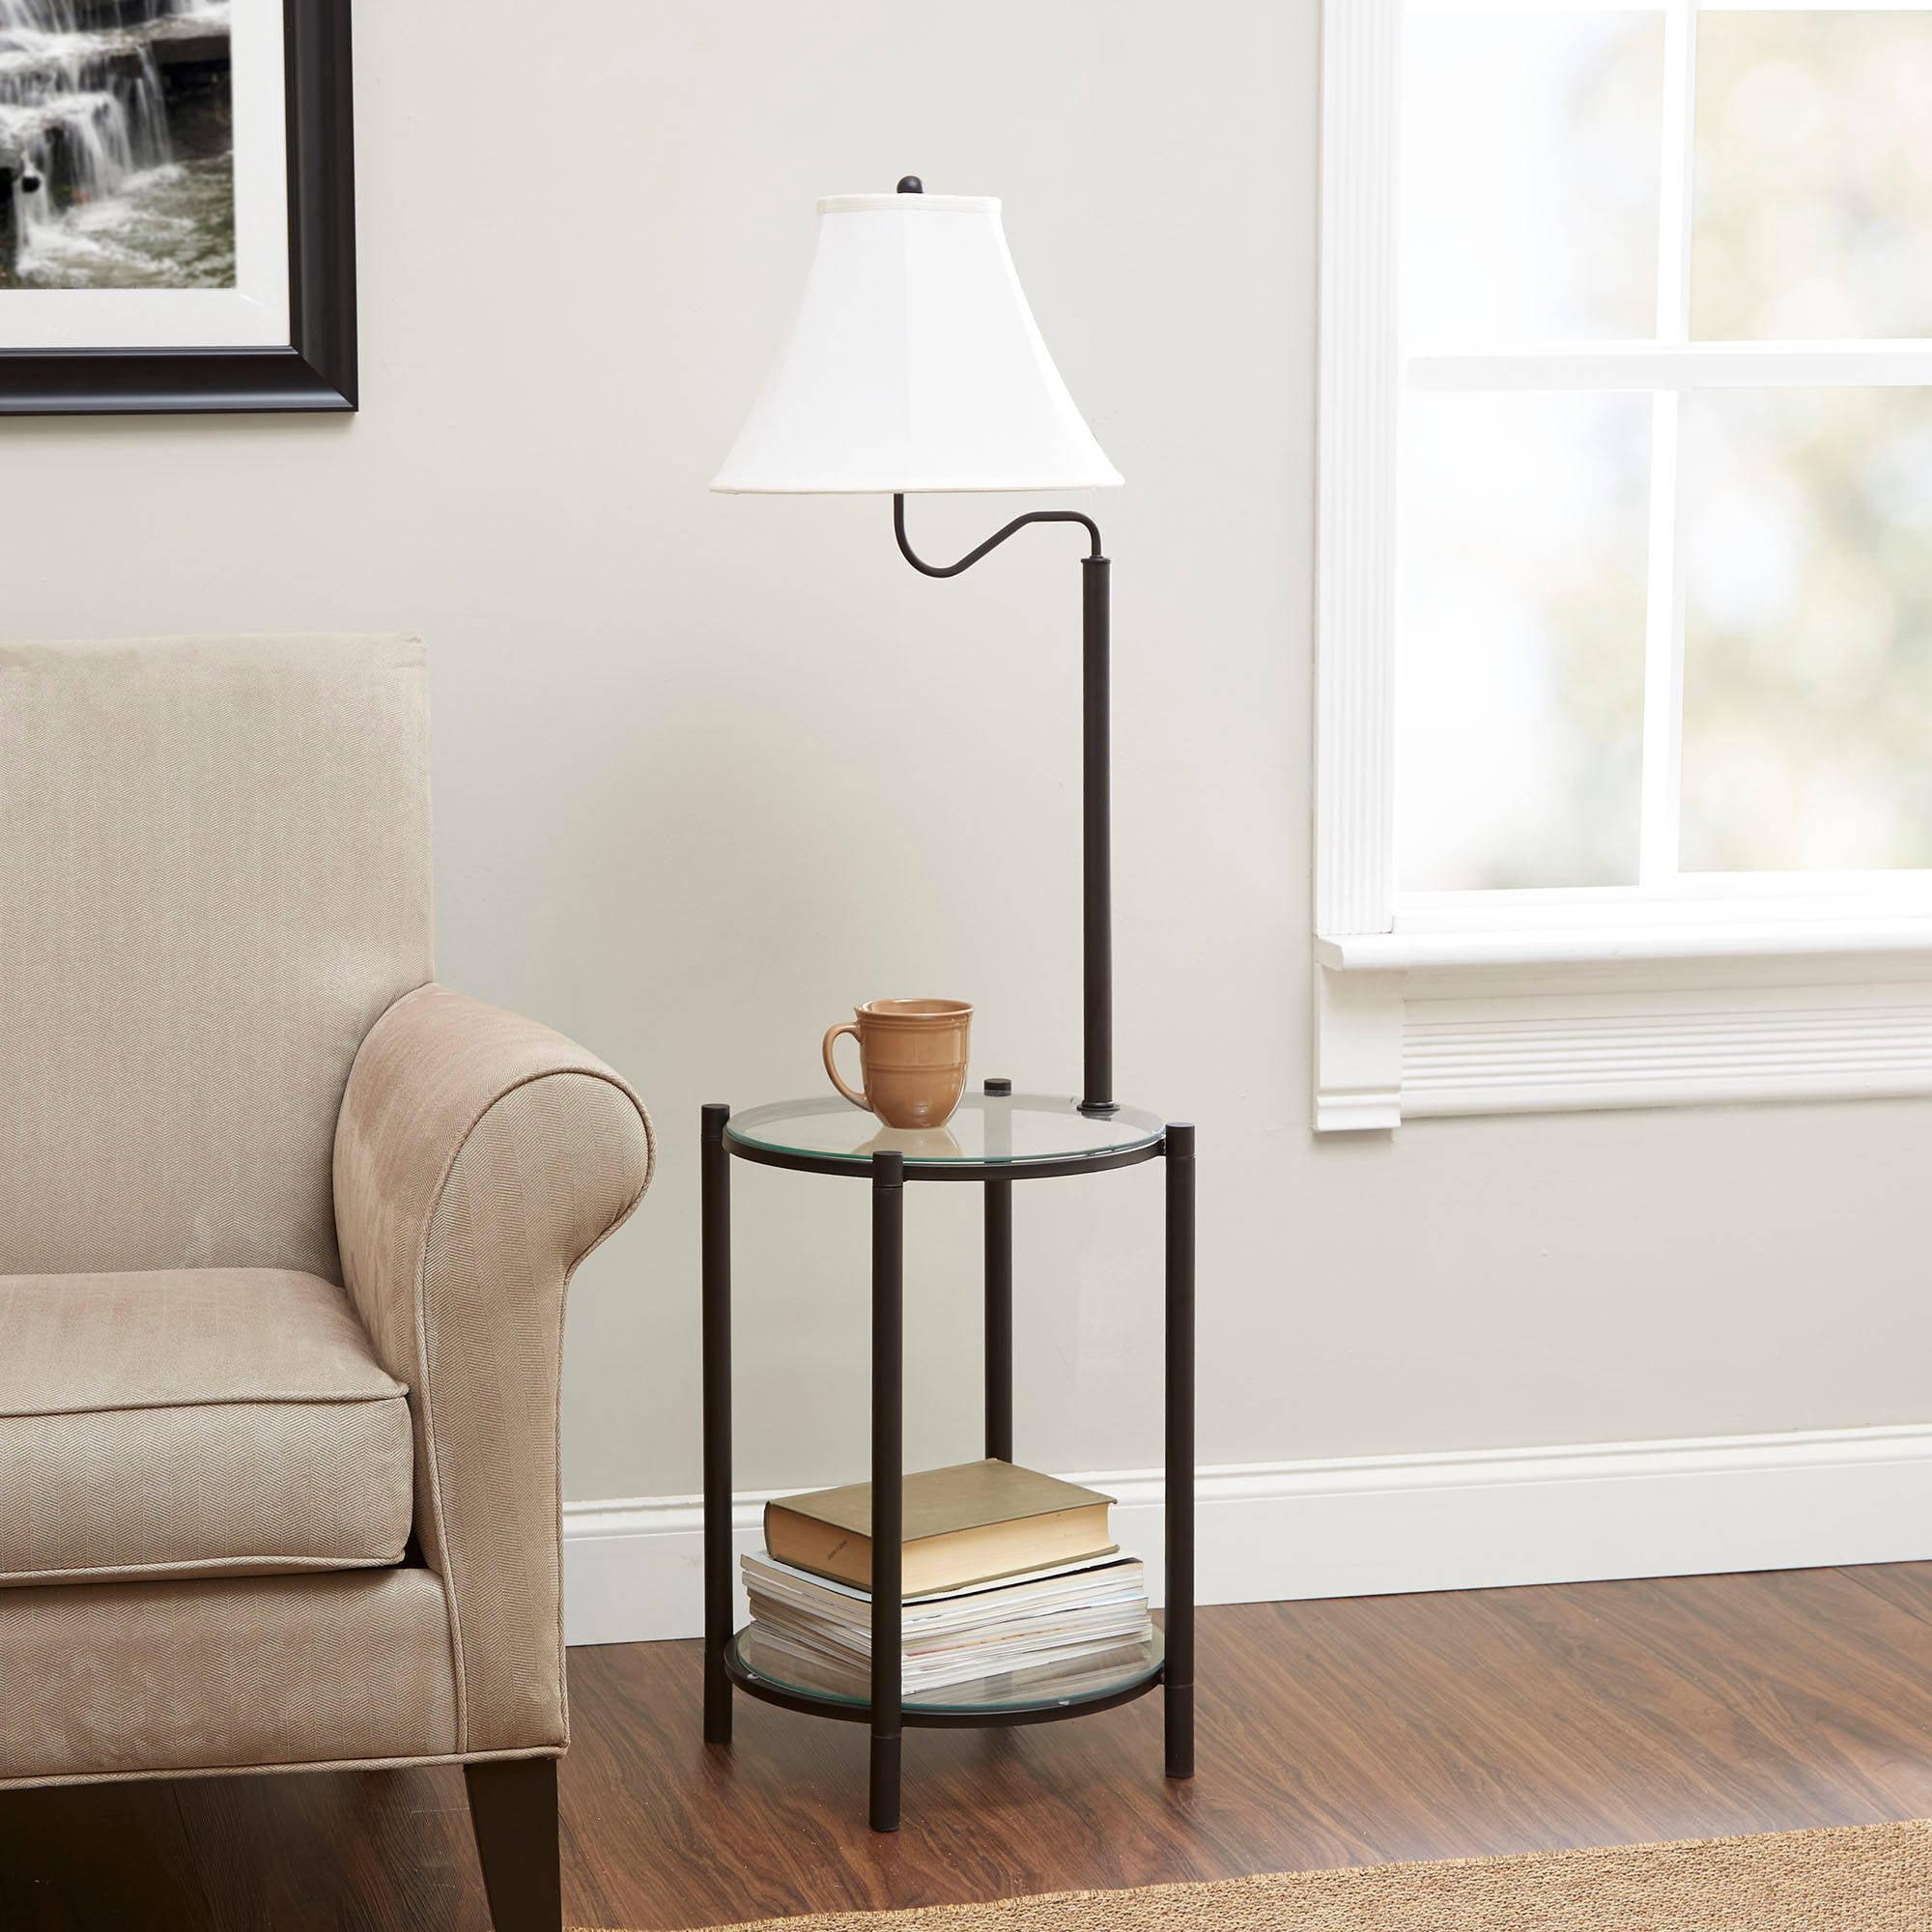 Mainstays Glass End Table Lamp, Matte Black